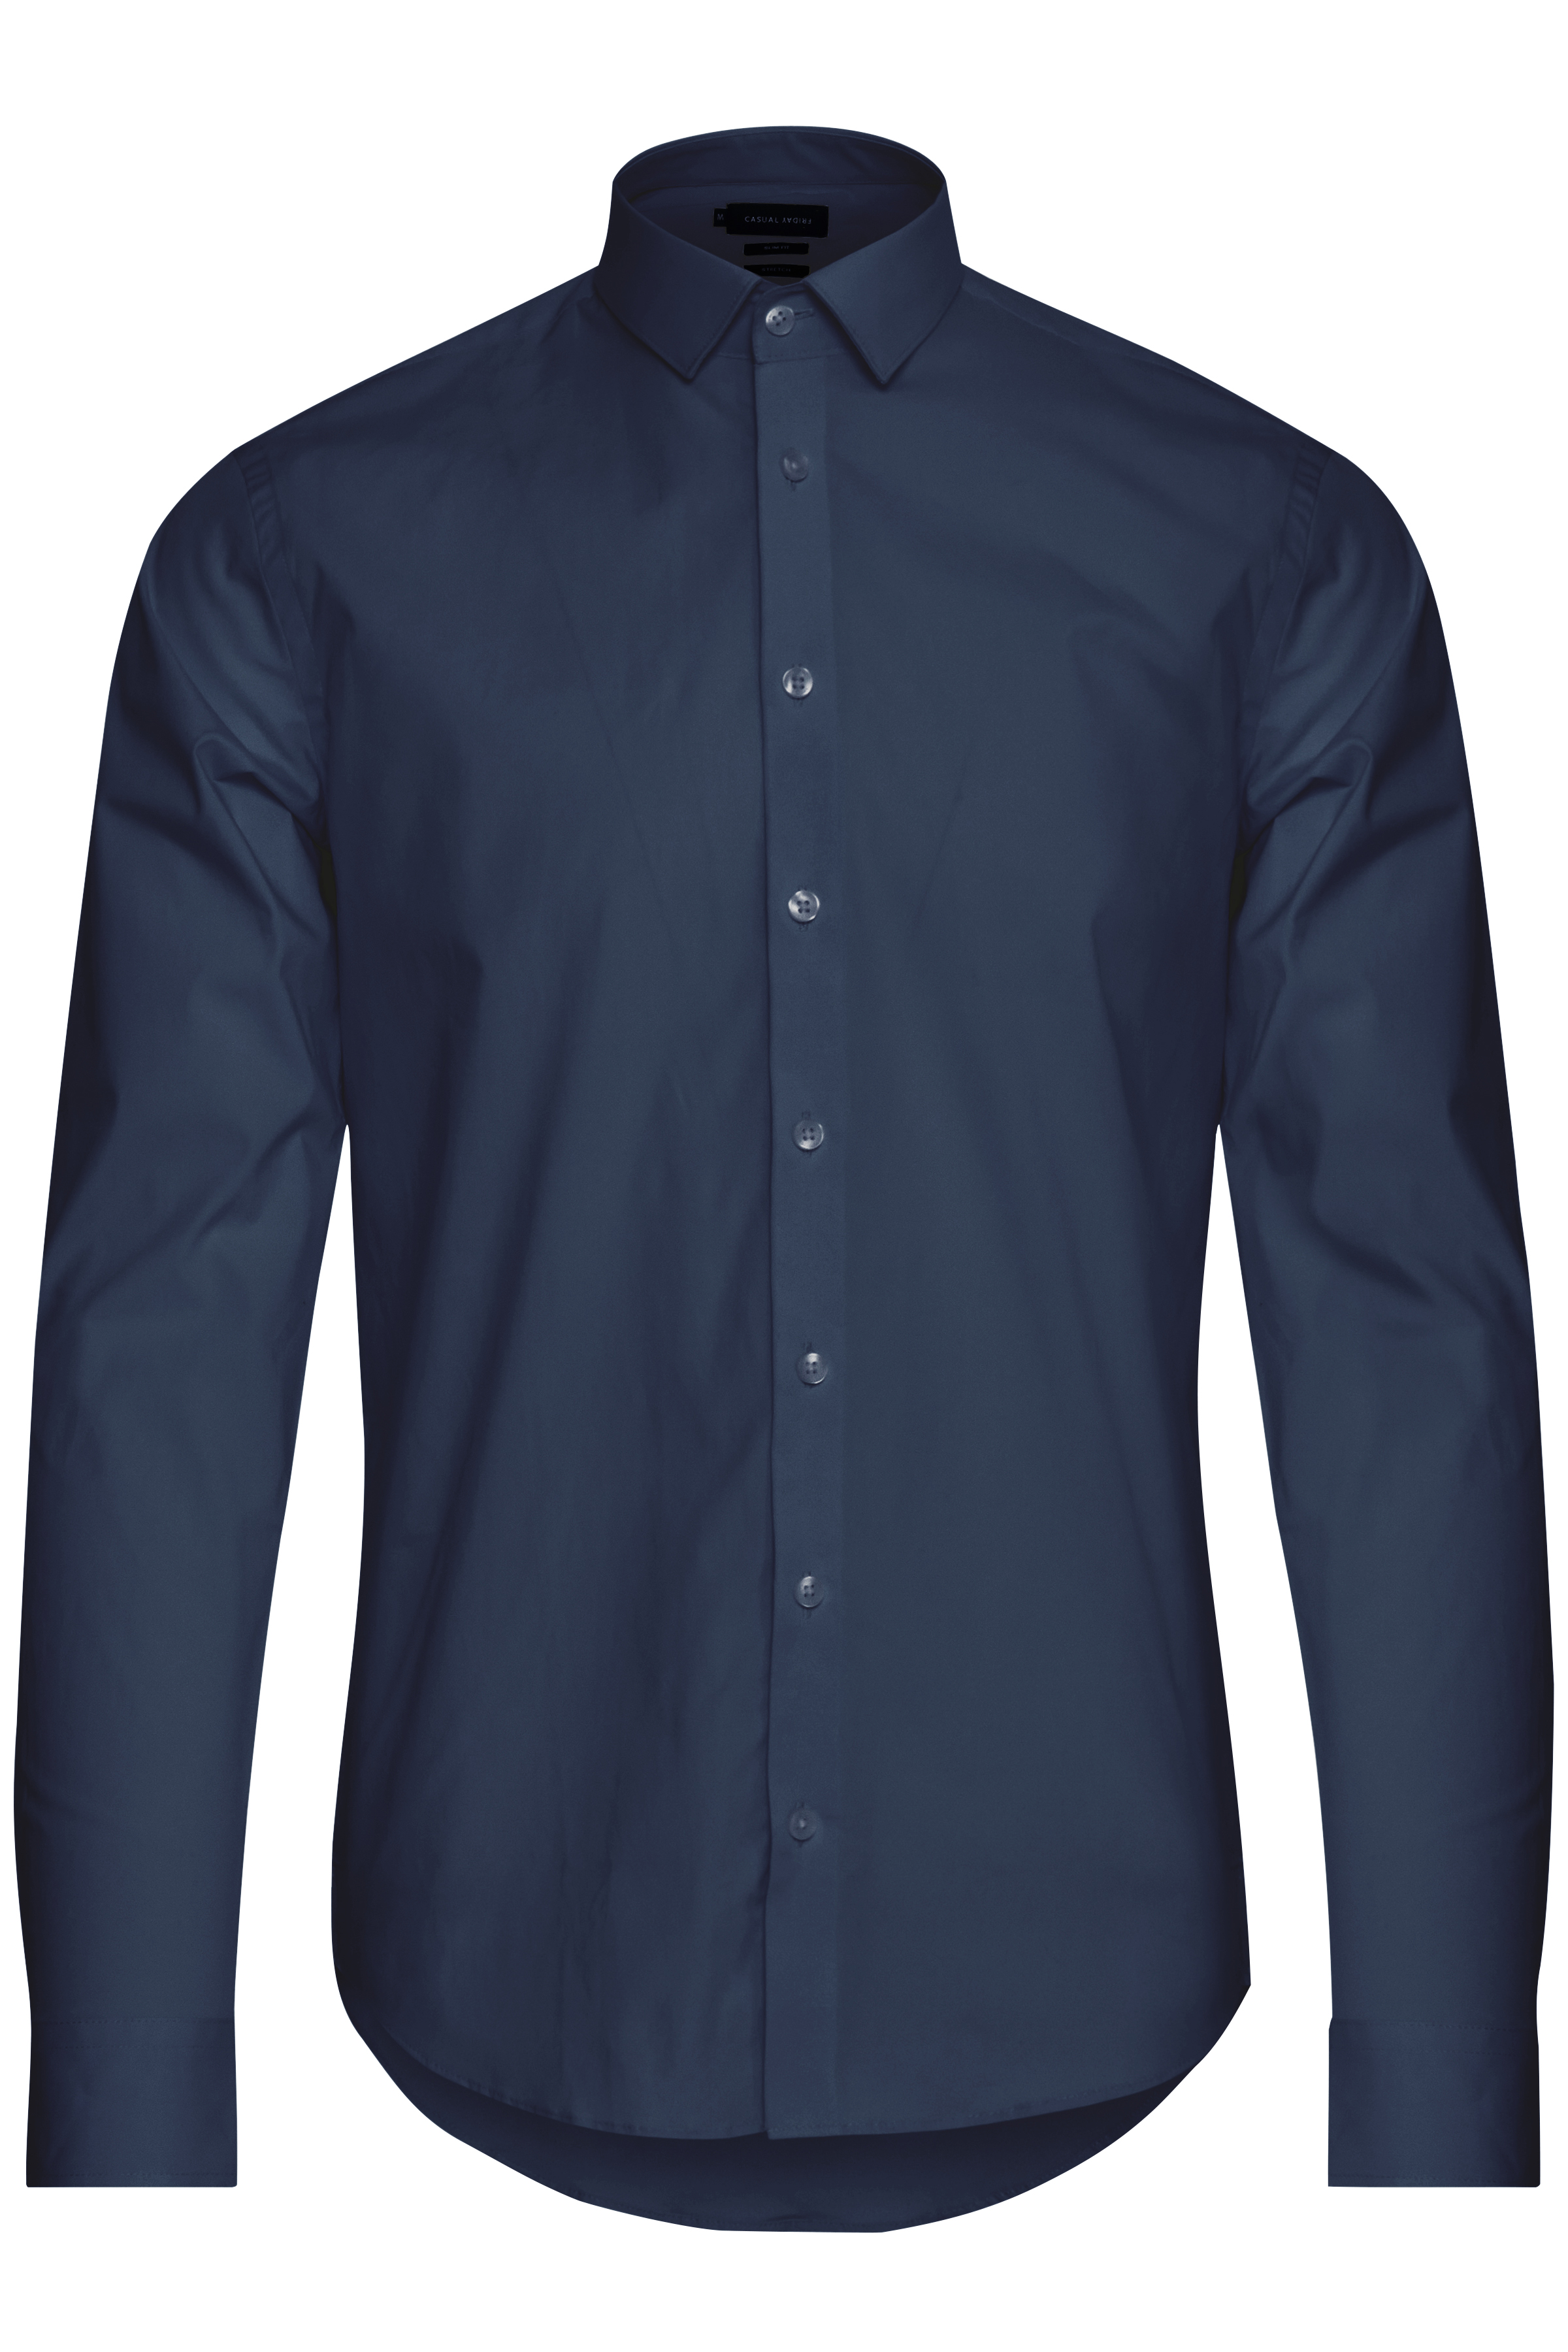 Image of Casual Friday Herre Flot skjorte - Navy